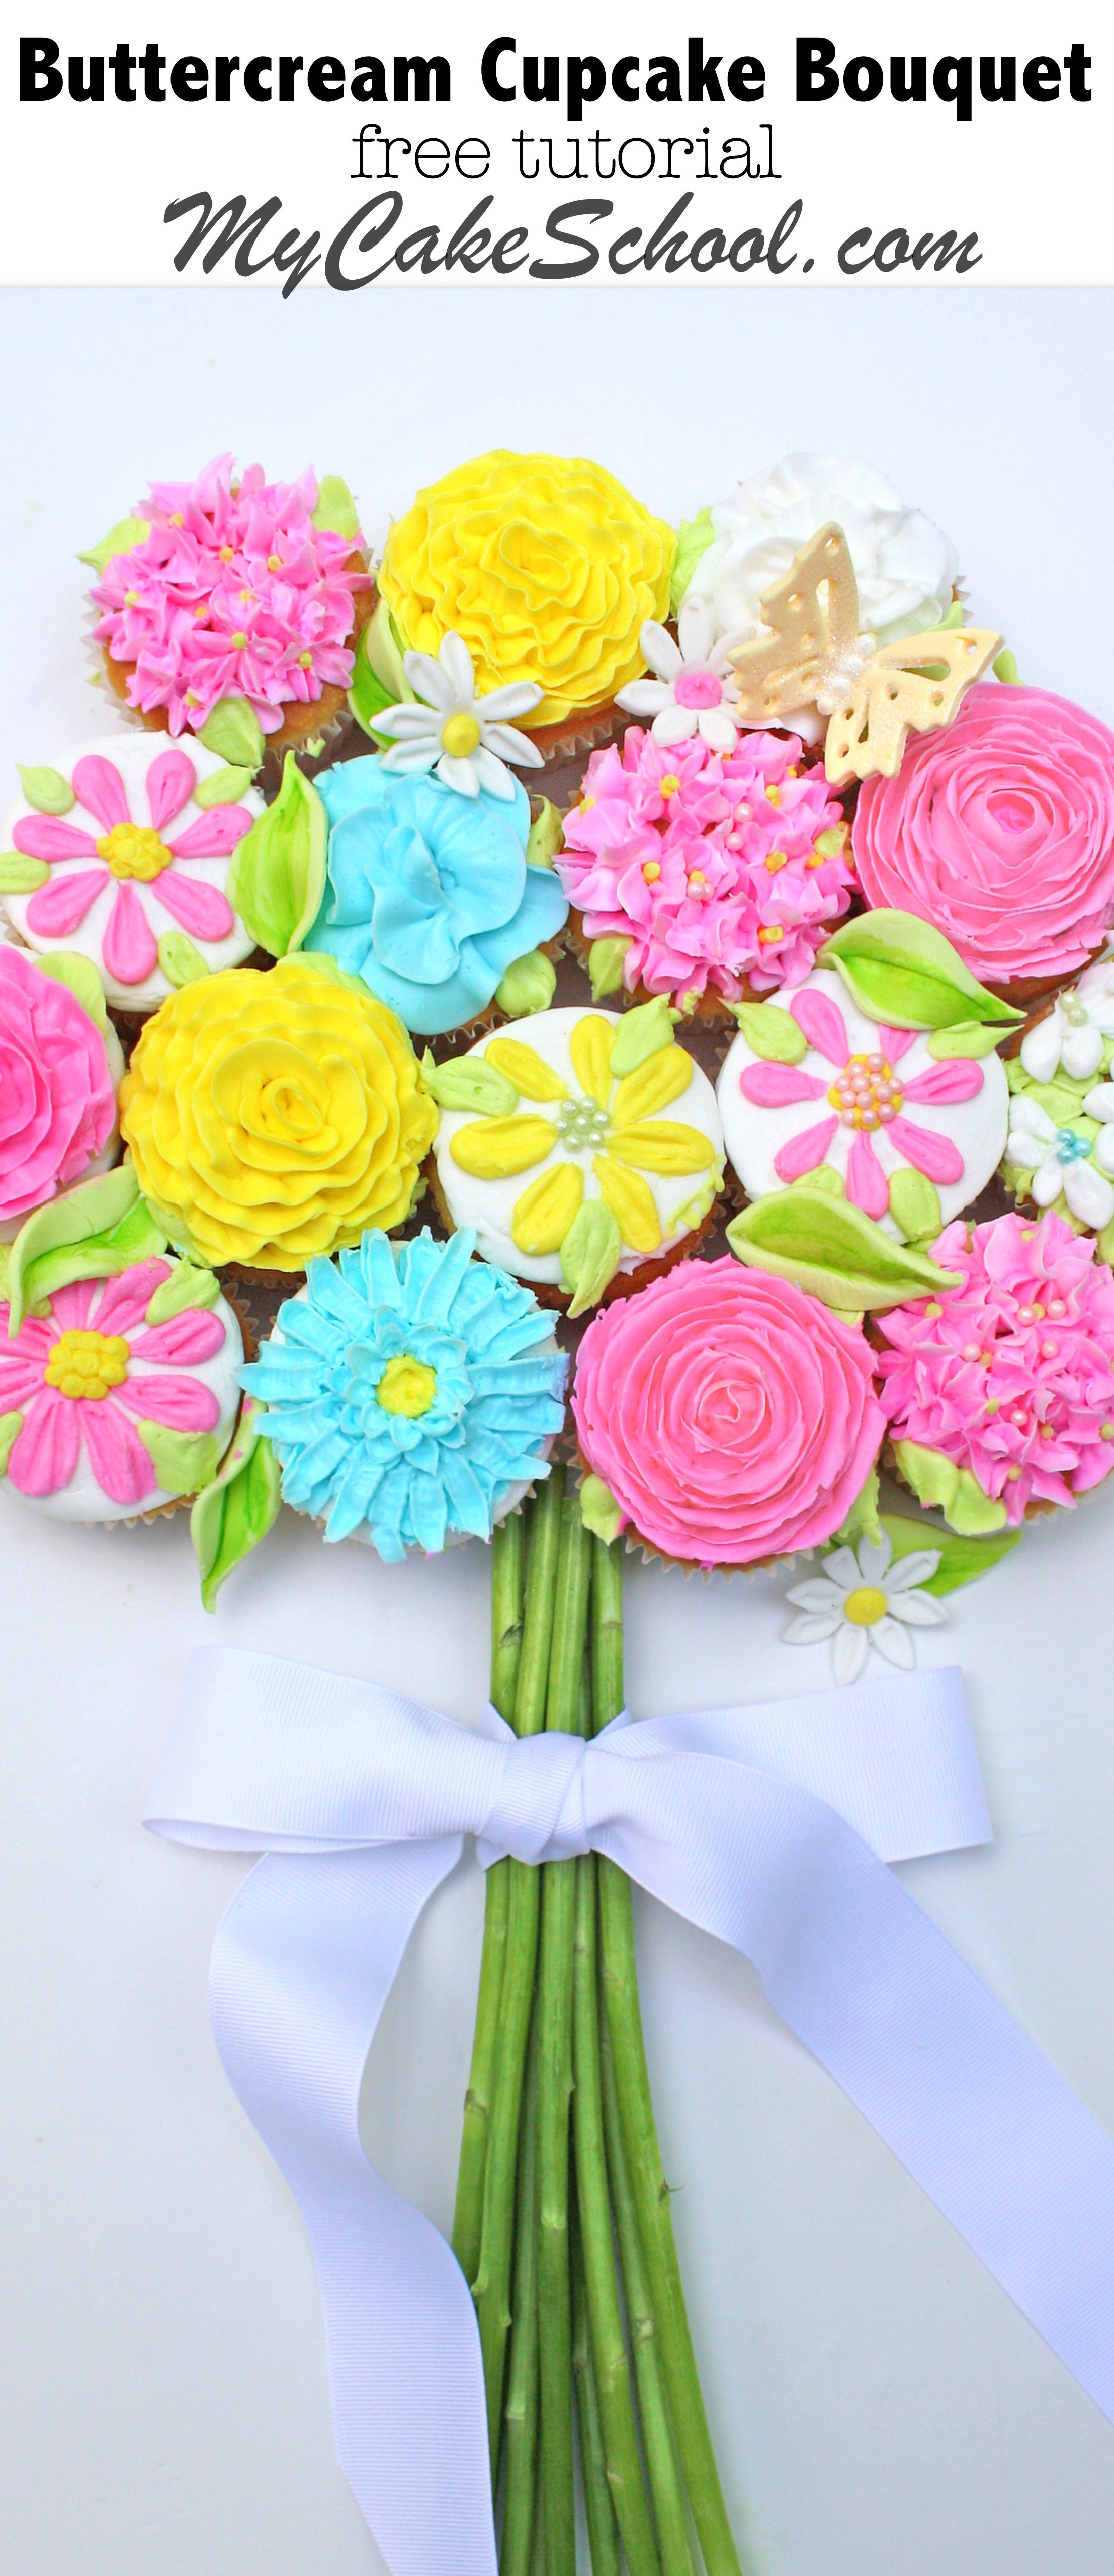 Free tutorial learn to make a beautiful cupcake bouquet learn how to make a beautiful bouquet of buttercream flowers in this mycakeschool free cake tutorial izmirmasajfo